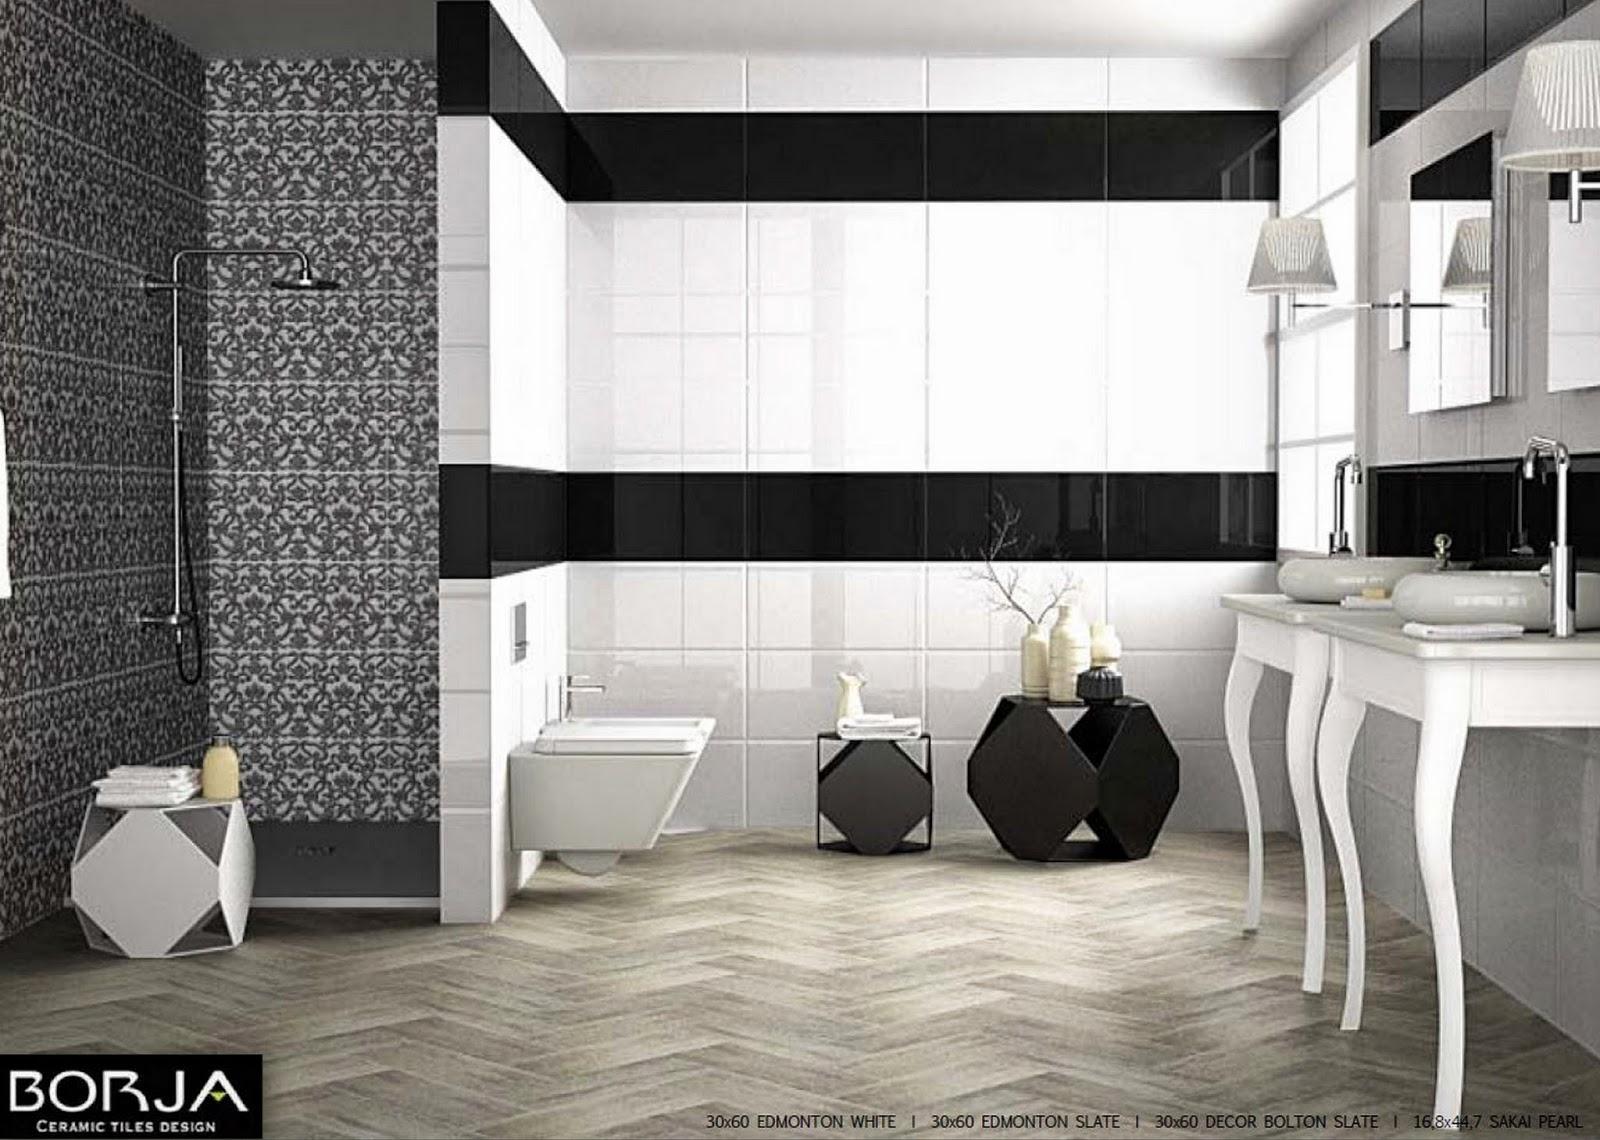 Black and white concept | BORJA CERAMIC TILES DESIGN